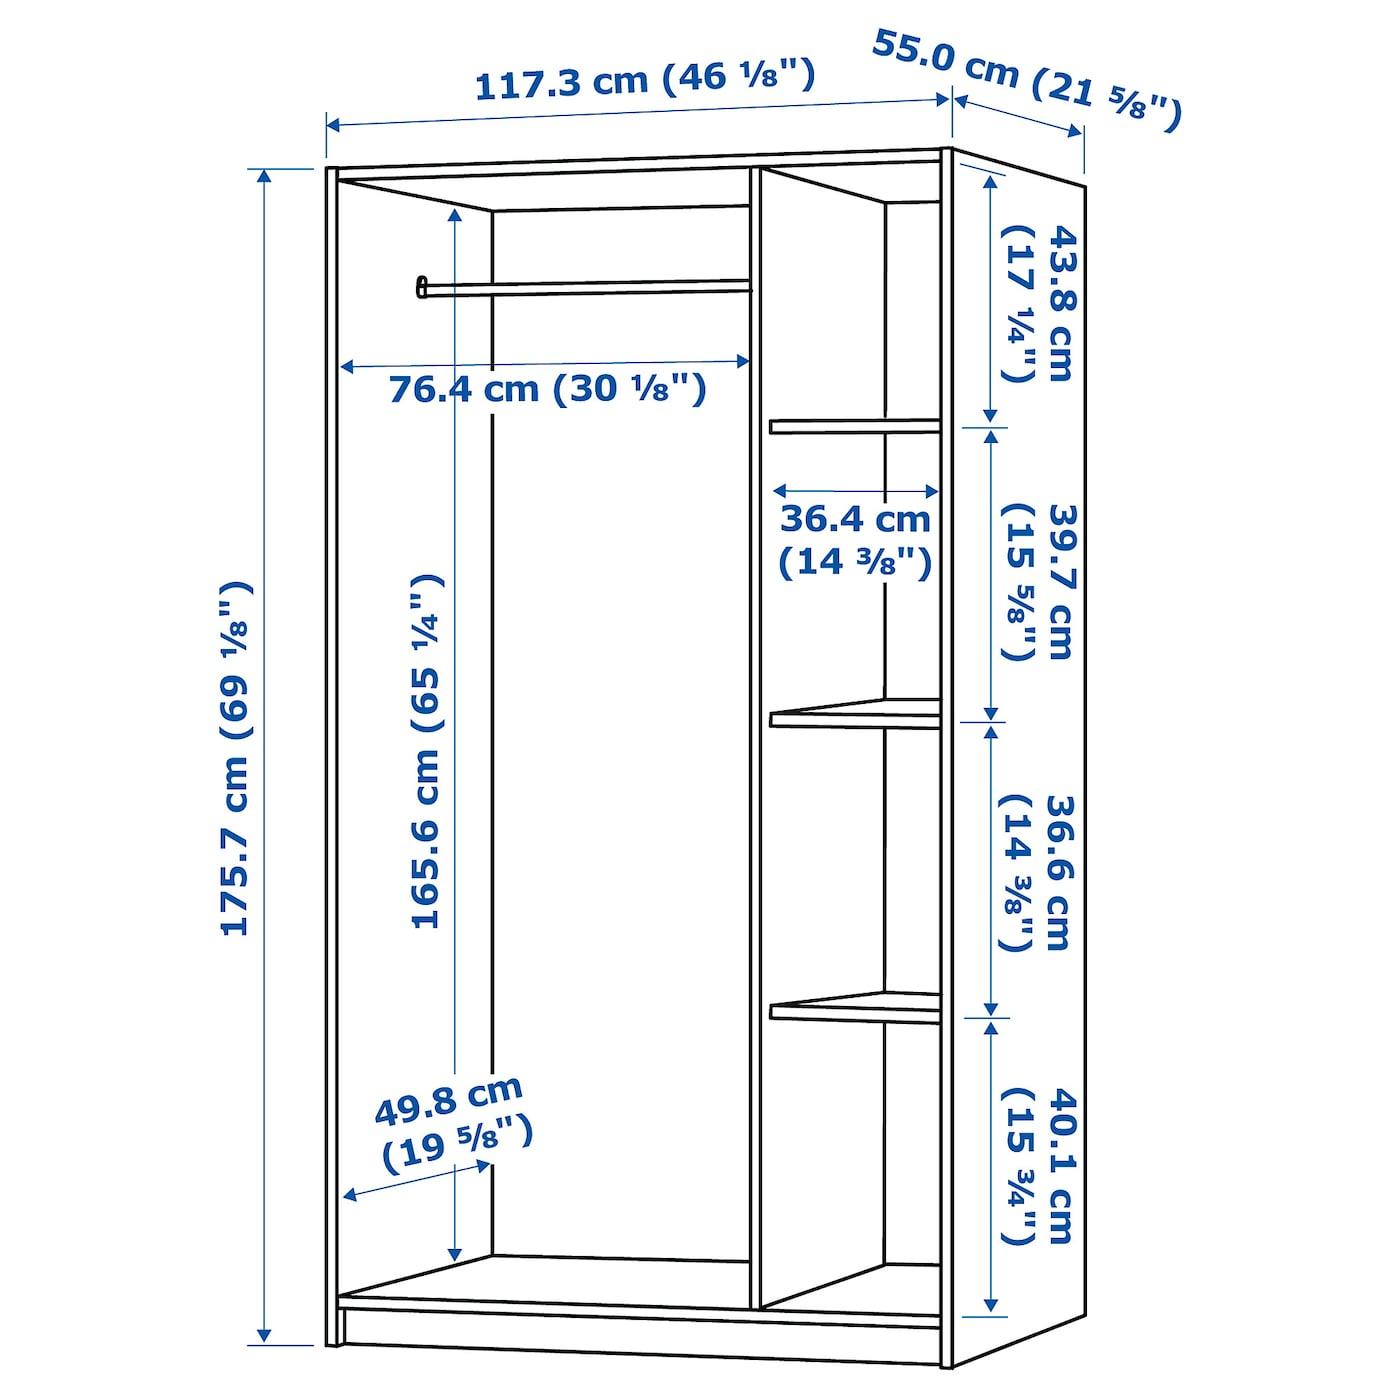 KLEPPSTAD Wardrobe with 3 doors - white 117x176 cm